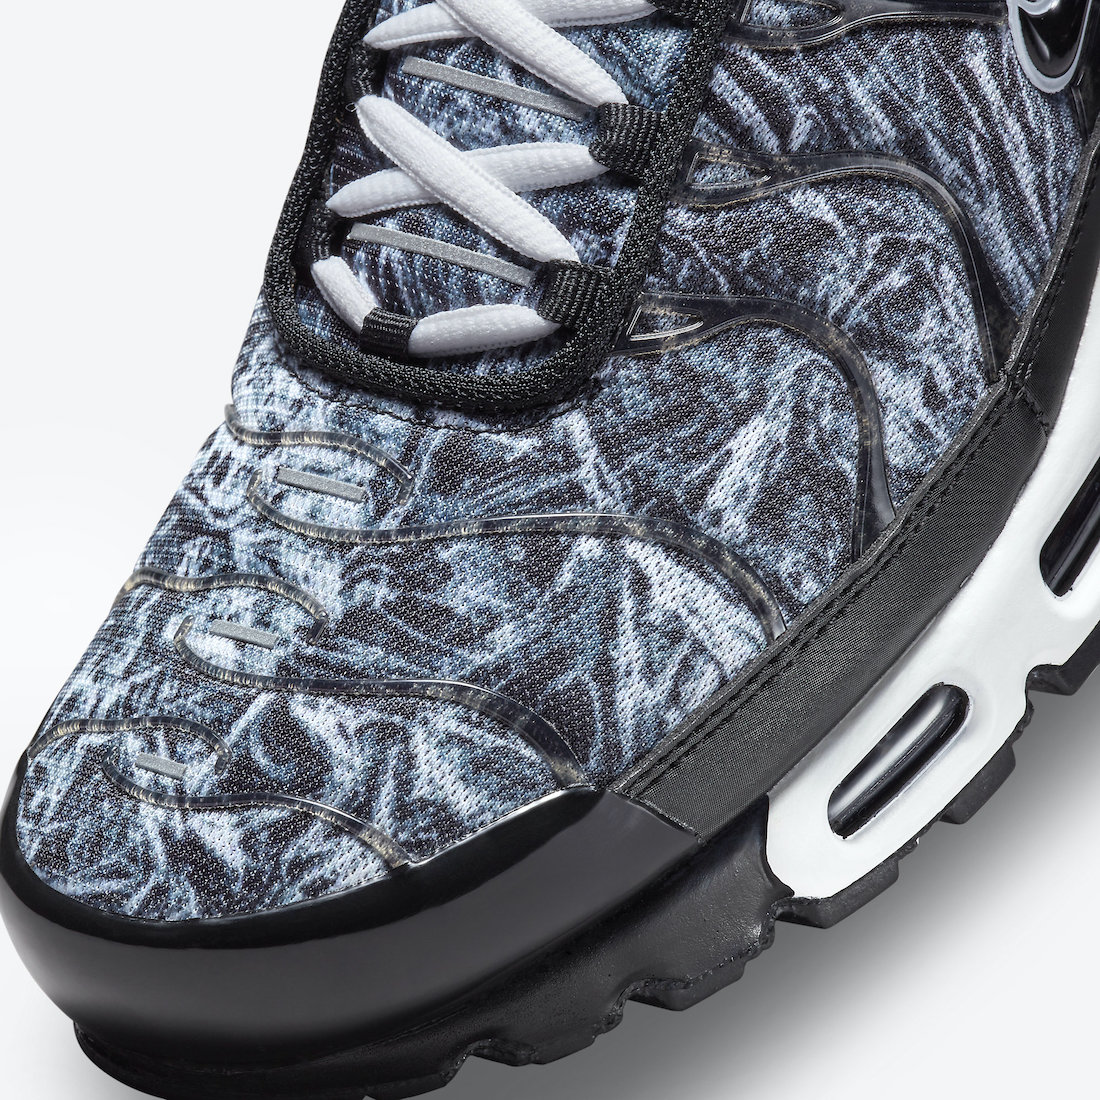 Nike Air Max Plus DO6384-001 Release Date Info